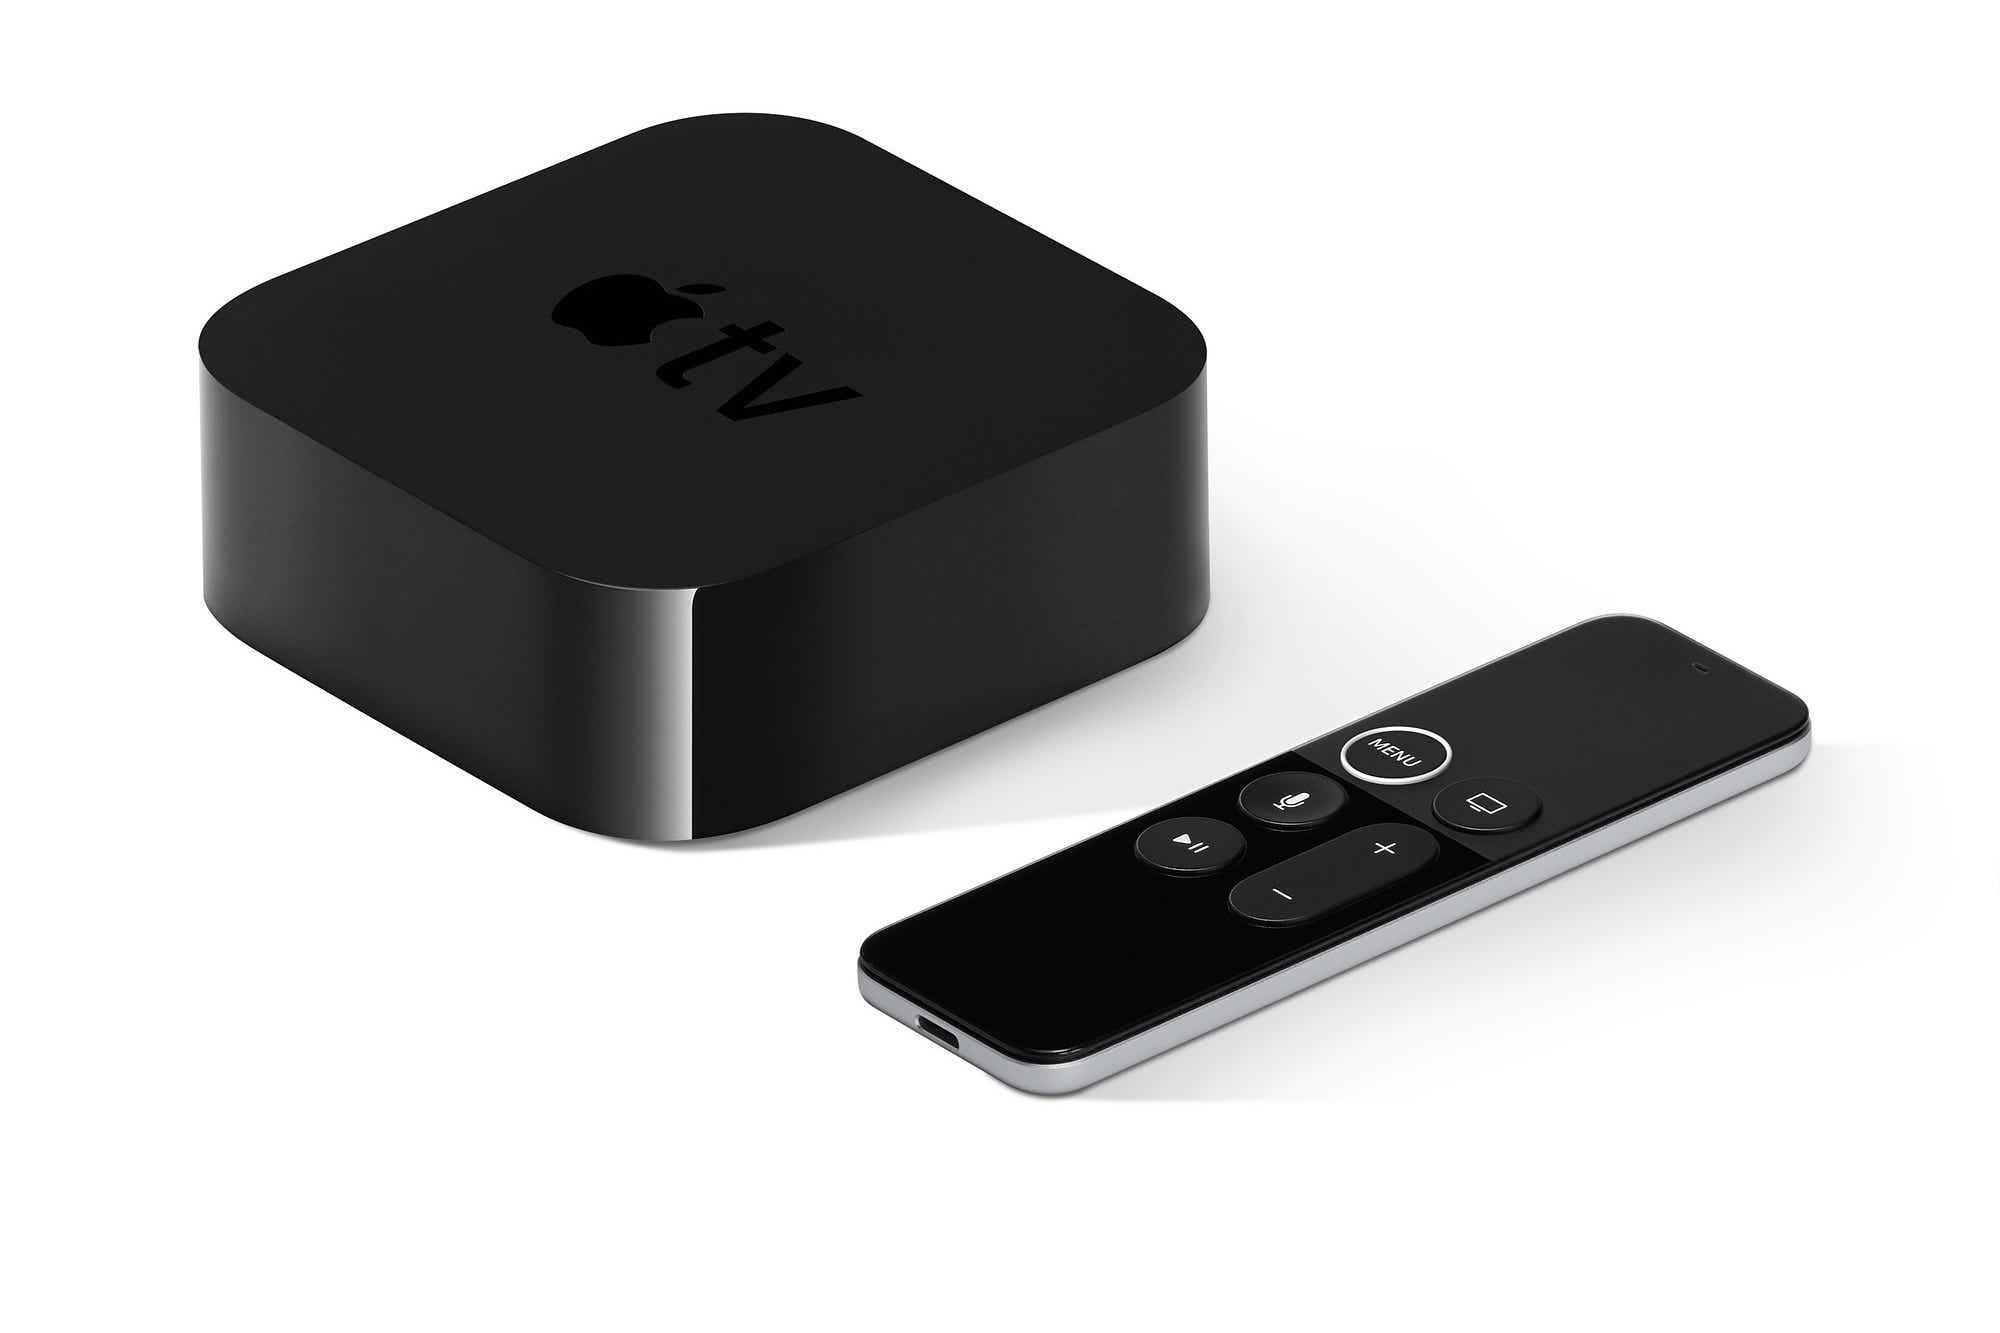 Apple TV (2015)